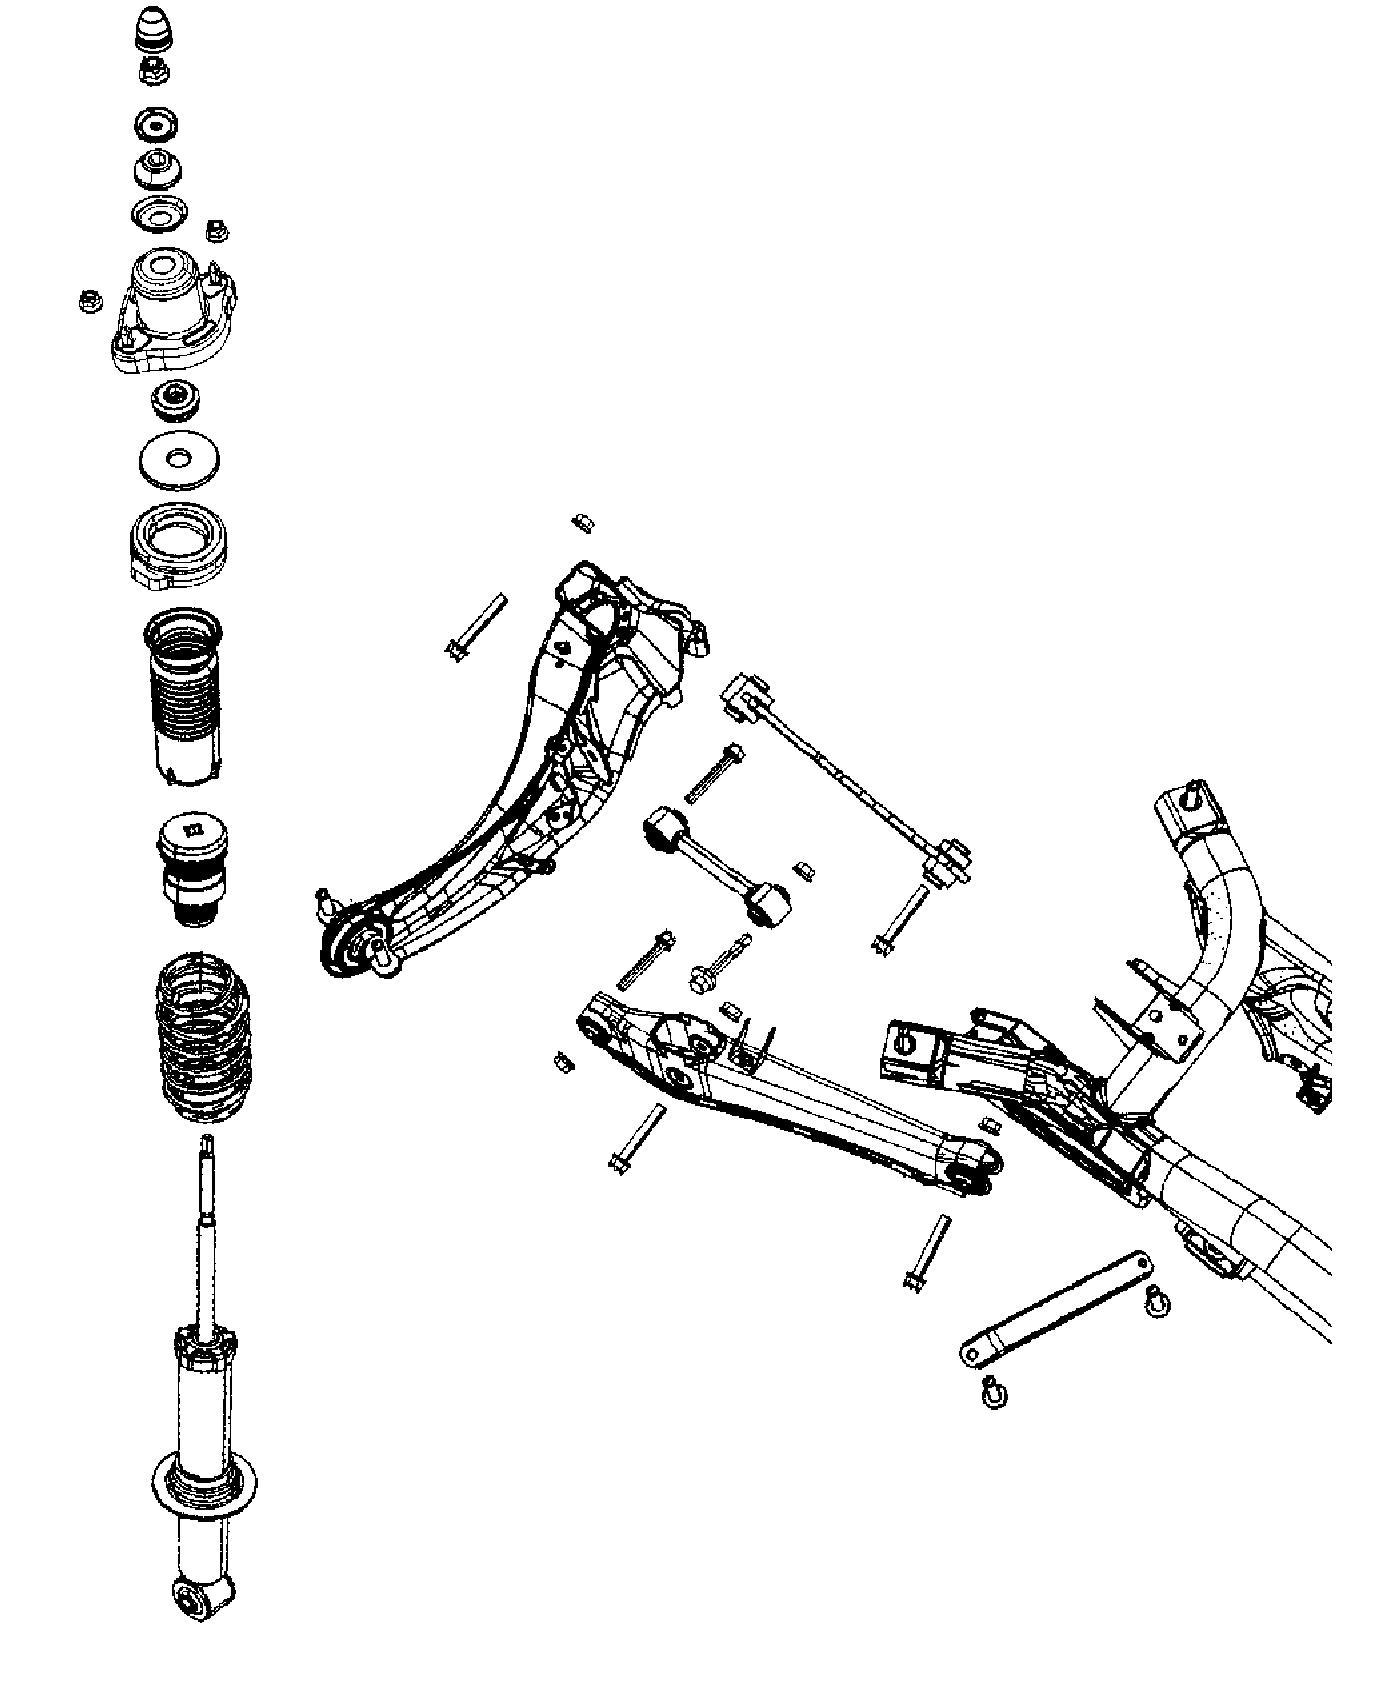 Jeep Suspension Diagram - Wiring Diagrams List on